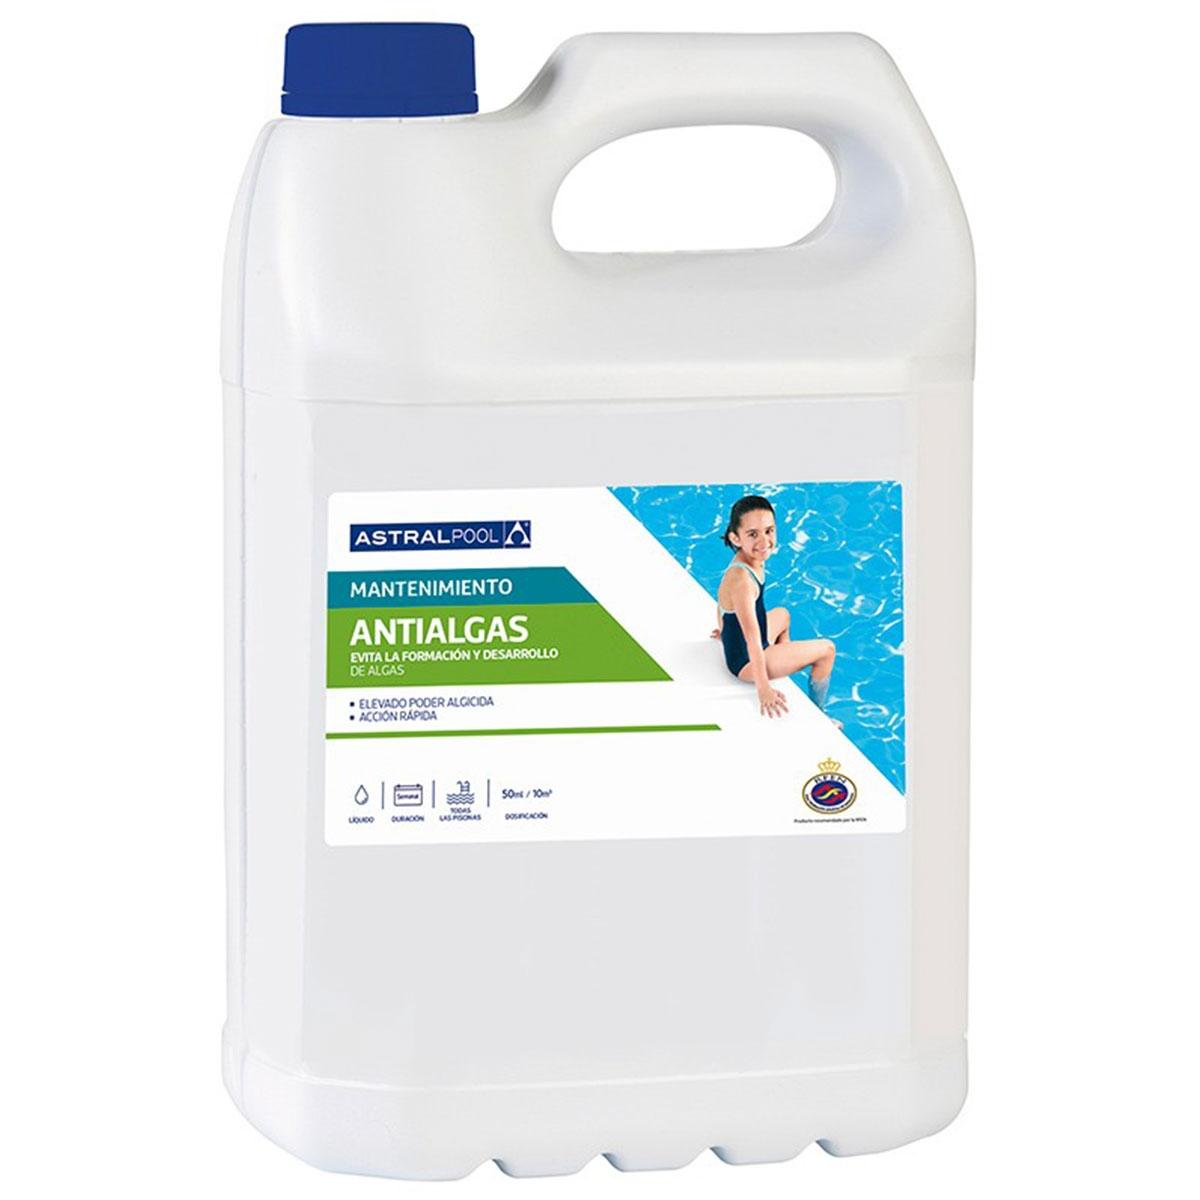 Antialgas - Limpieza de piscinas - Marca Astralpool